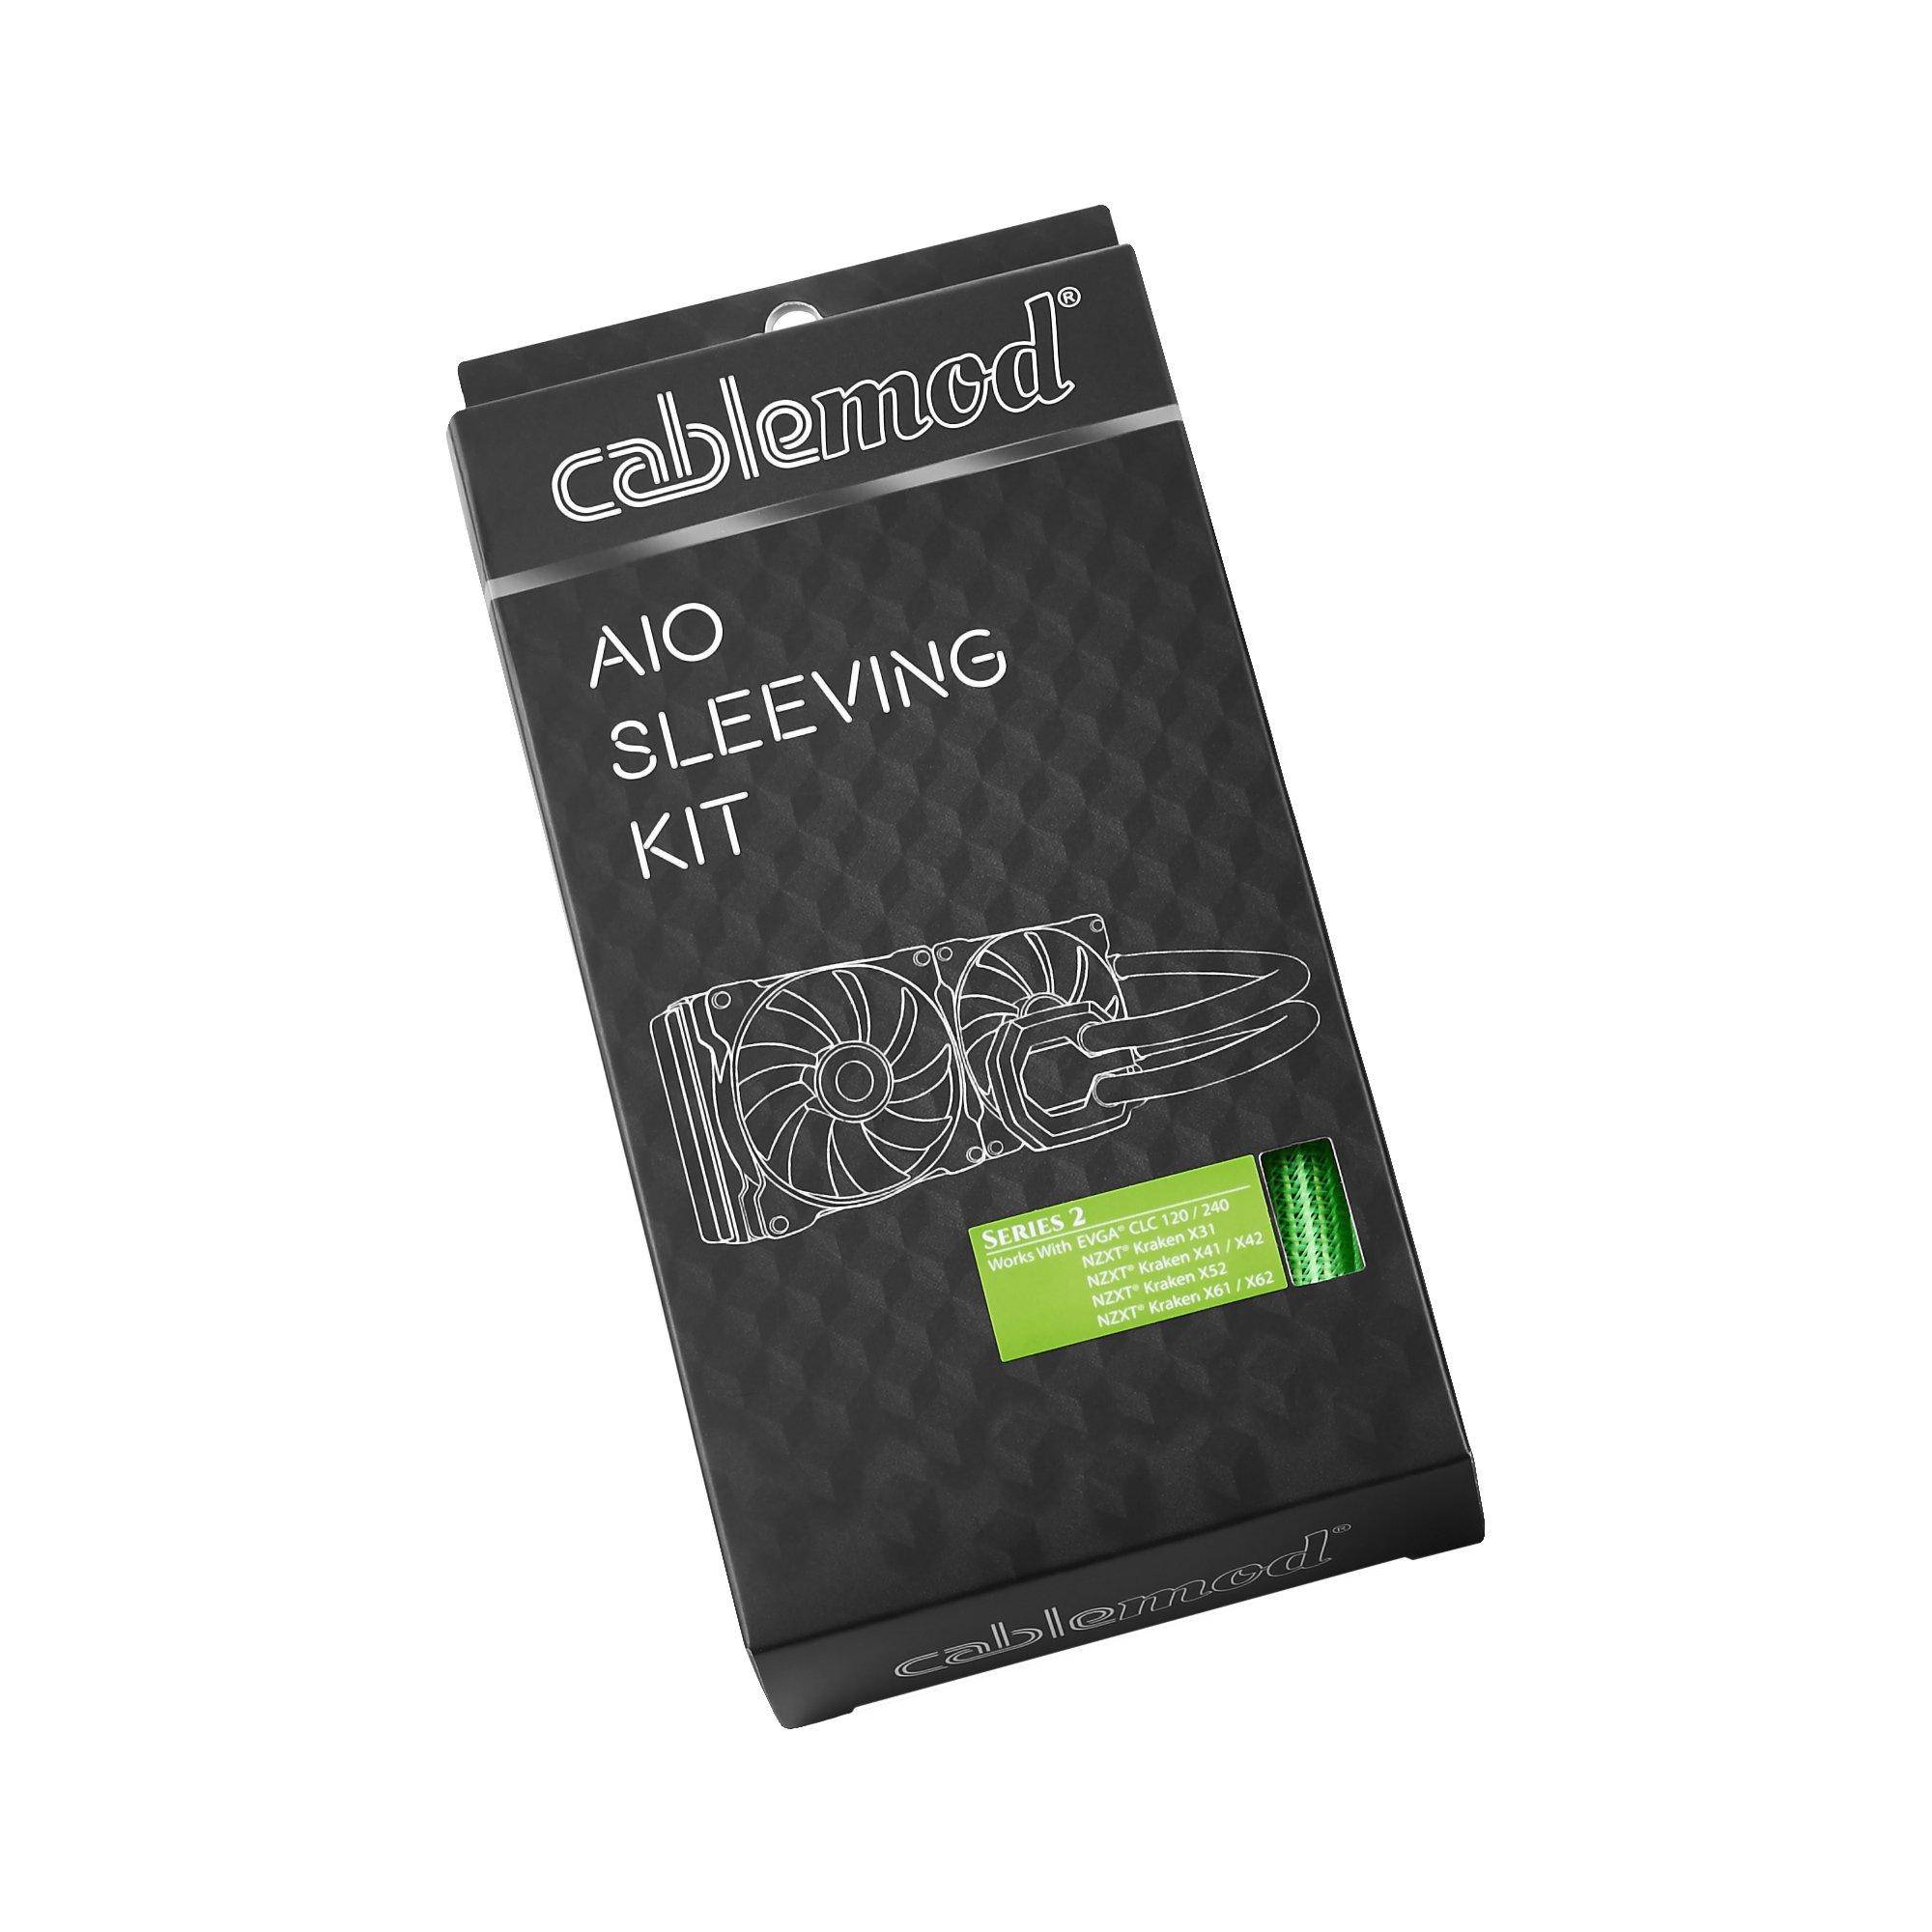 CABLEMOD AIO SLEEVING KIT SERIES 2 FOR NZXT KRAKEN / CORSAIR HYDRO PRO / EVGA CLC / EVGA GPU HYBRID (Light Green)